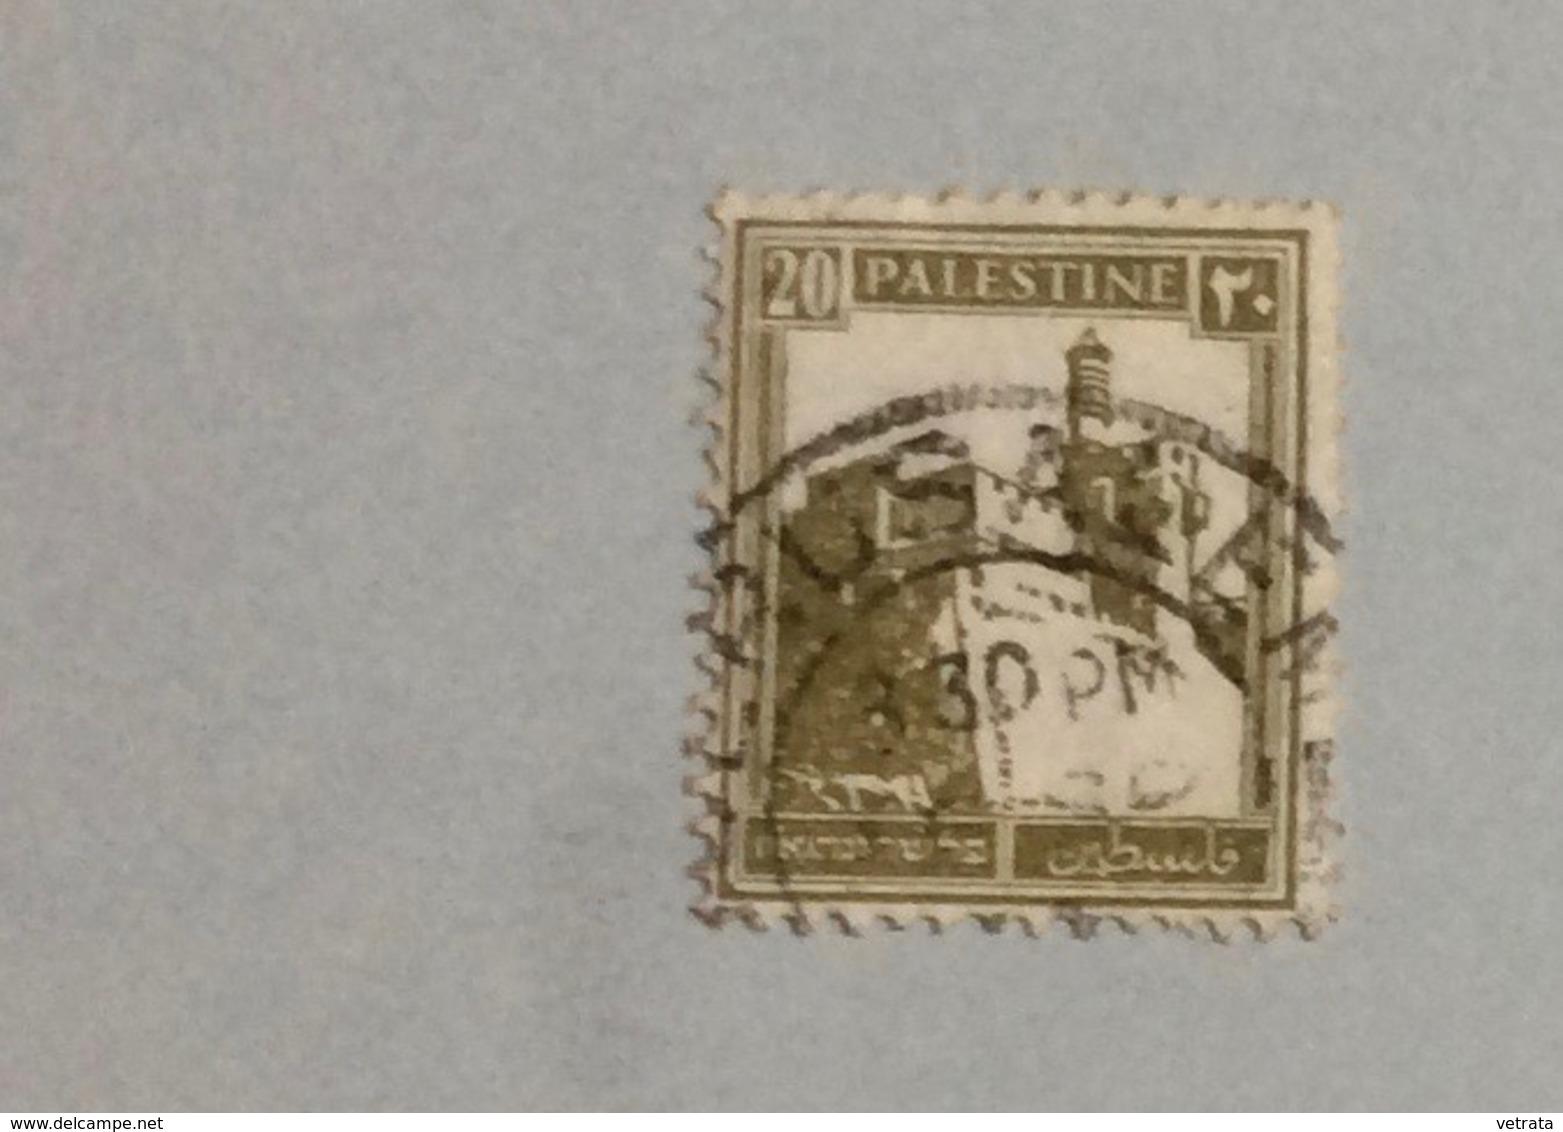 TIMBRE OBLITERE DE PALESTINE - CITADELLE DE JERUSALEM - Palestine